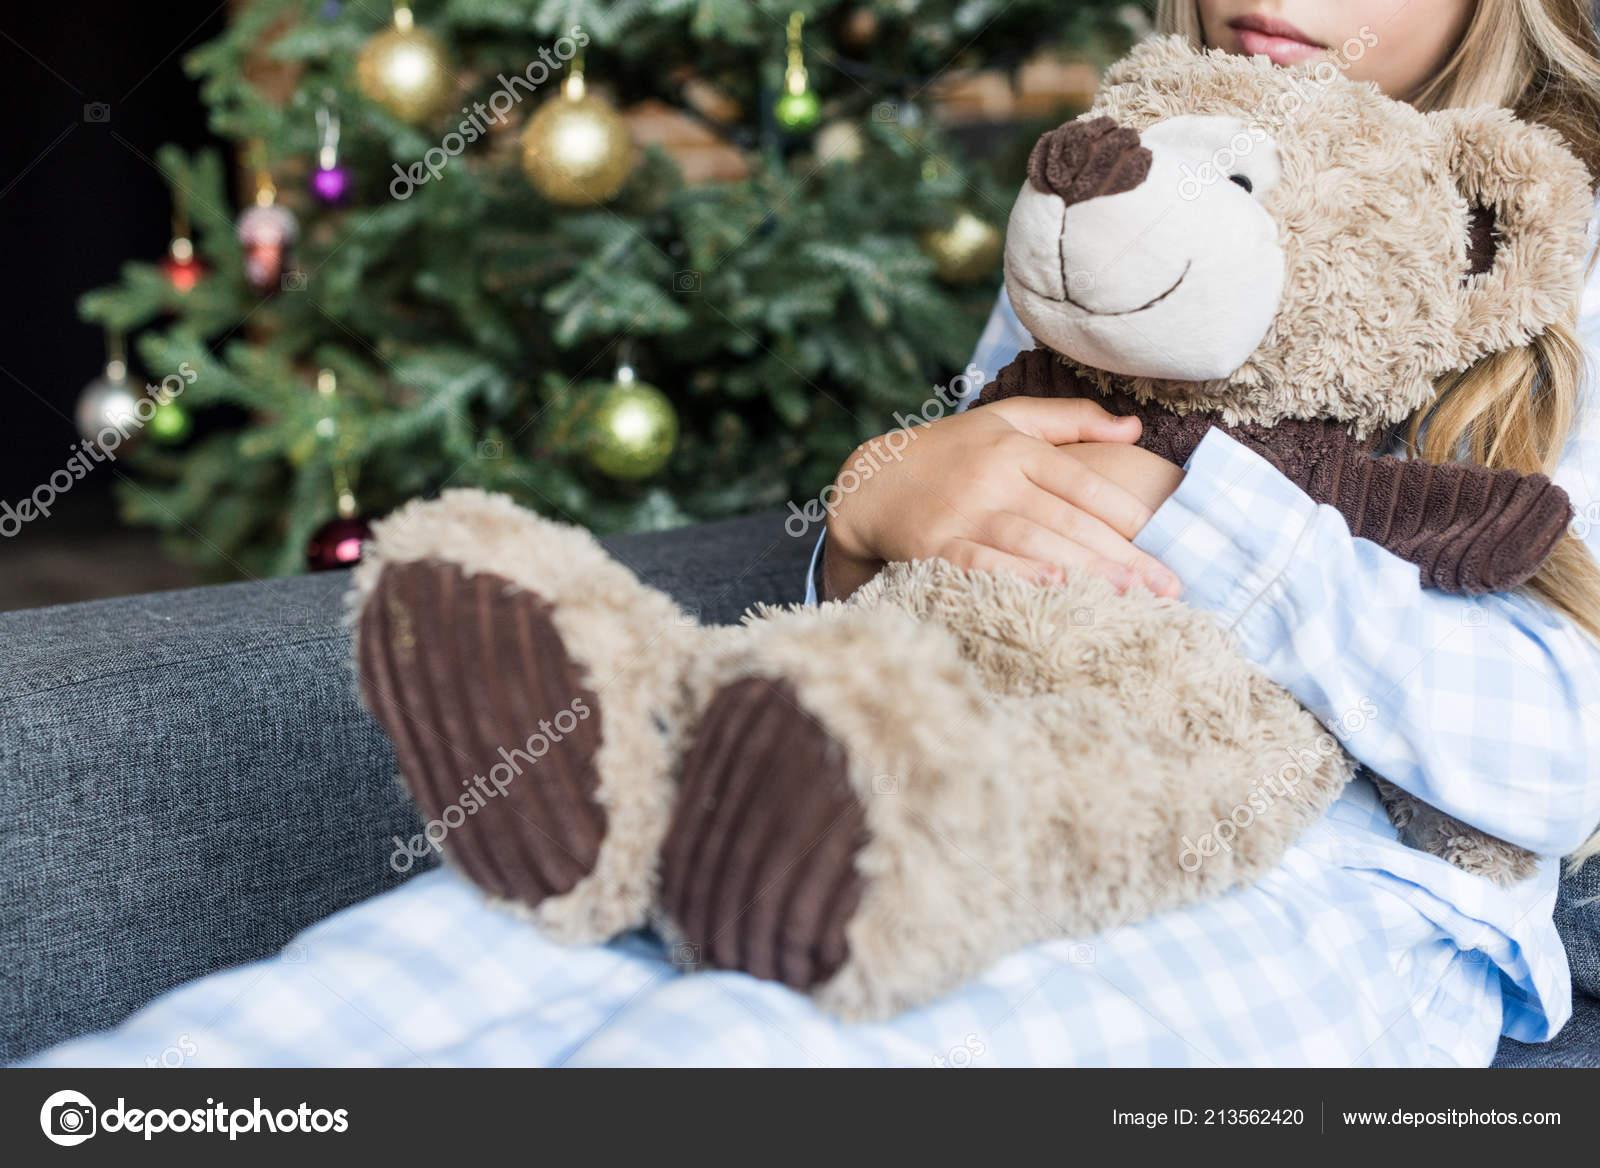 Recortar Tiro Niños Abrazos Oso Peluche Sentado Sofá Navidad Foto